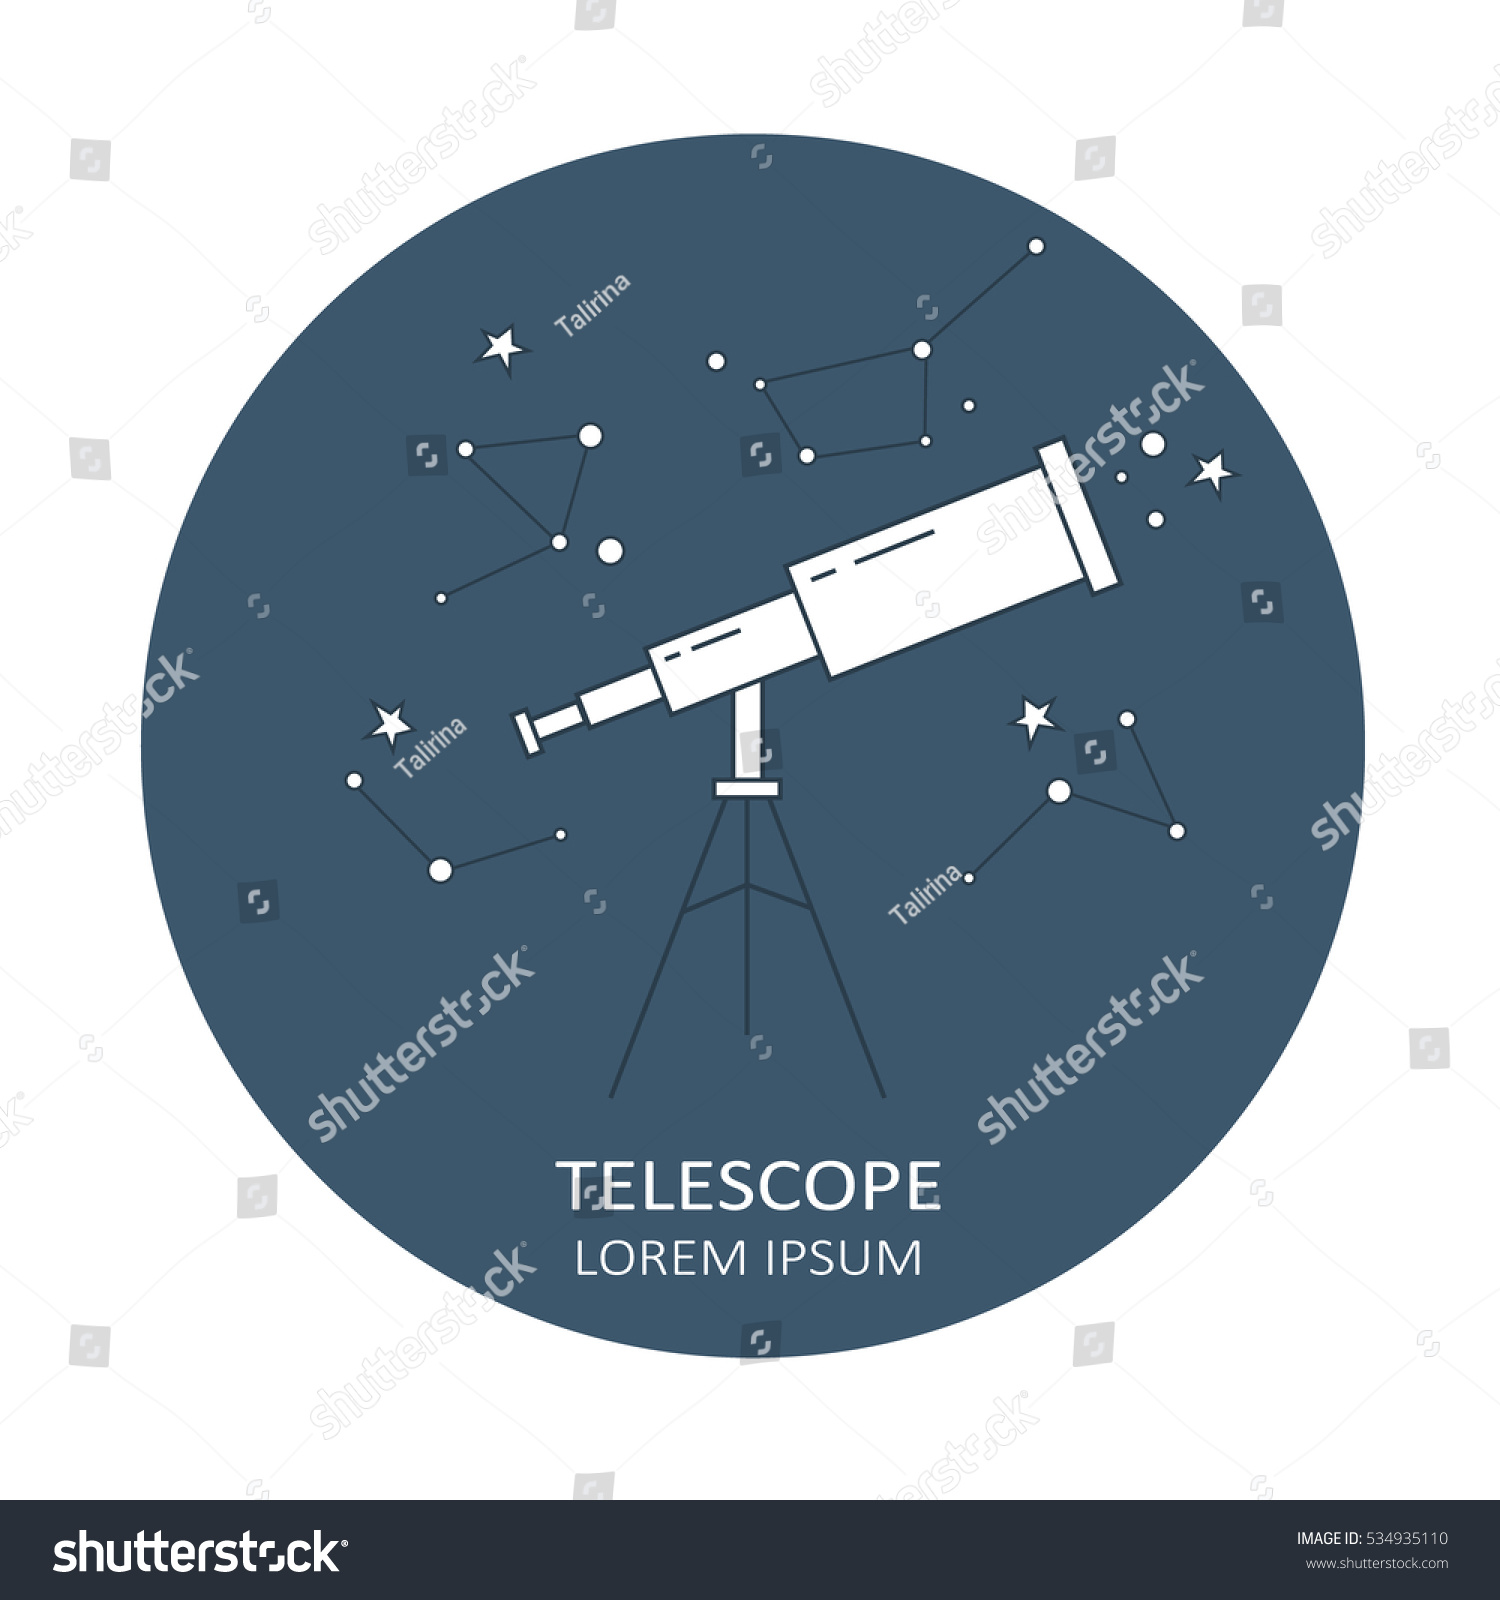 Simple Illustration Telescope Poster Design Navy Stock Vector